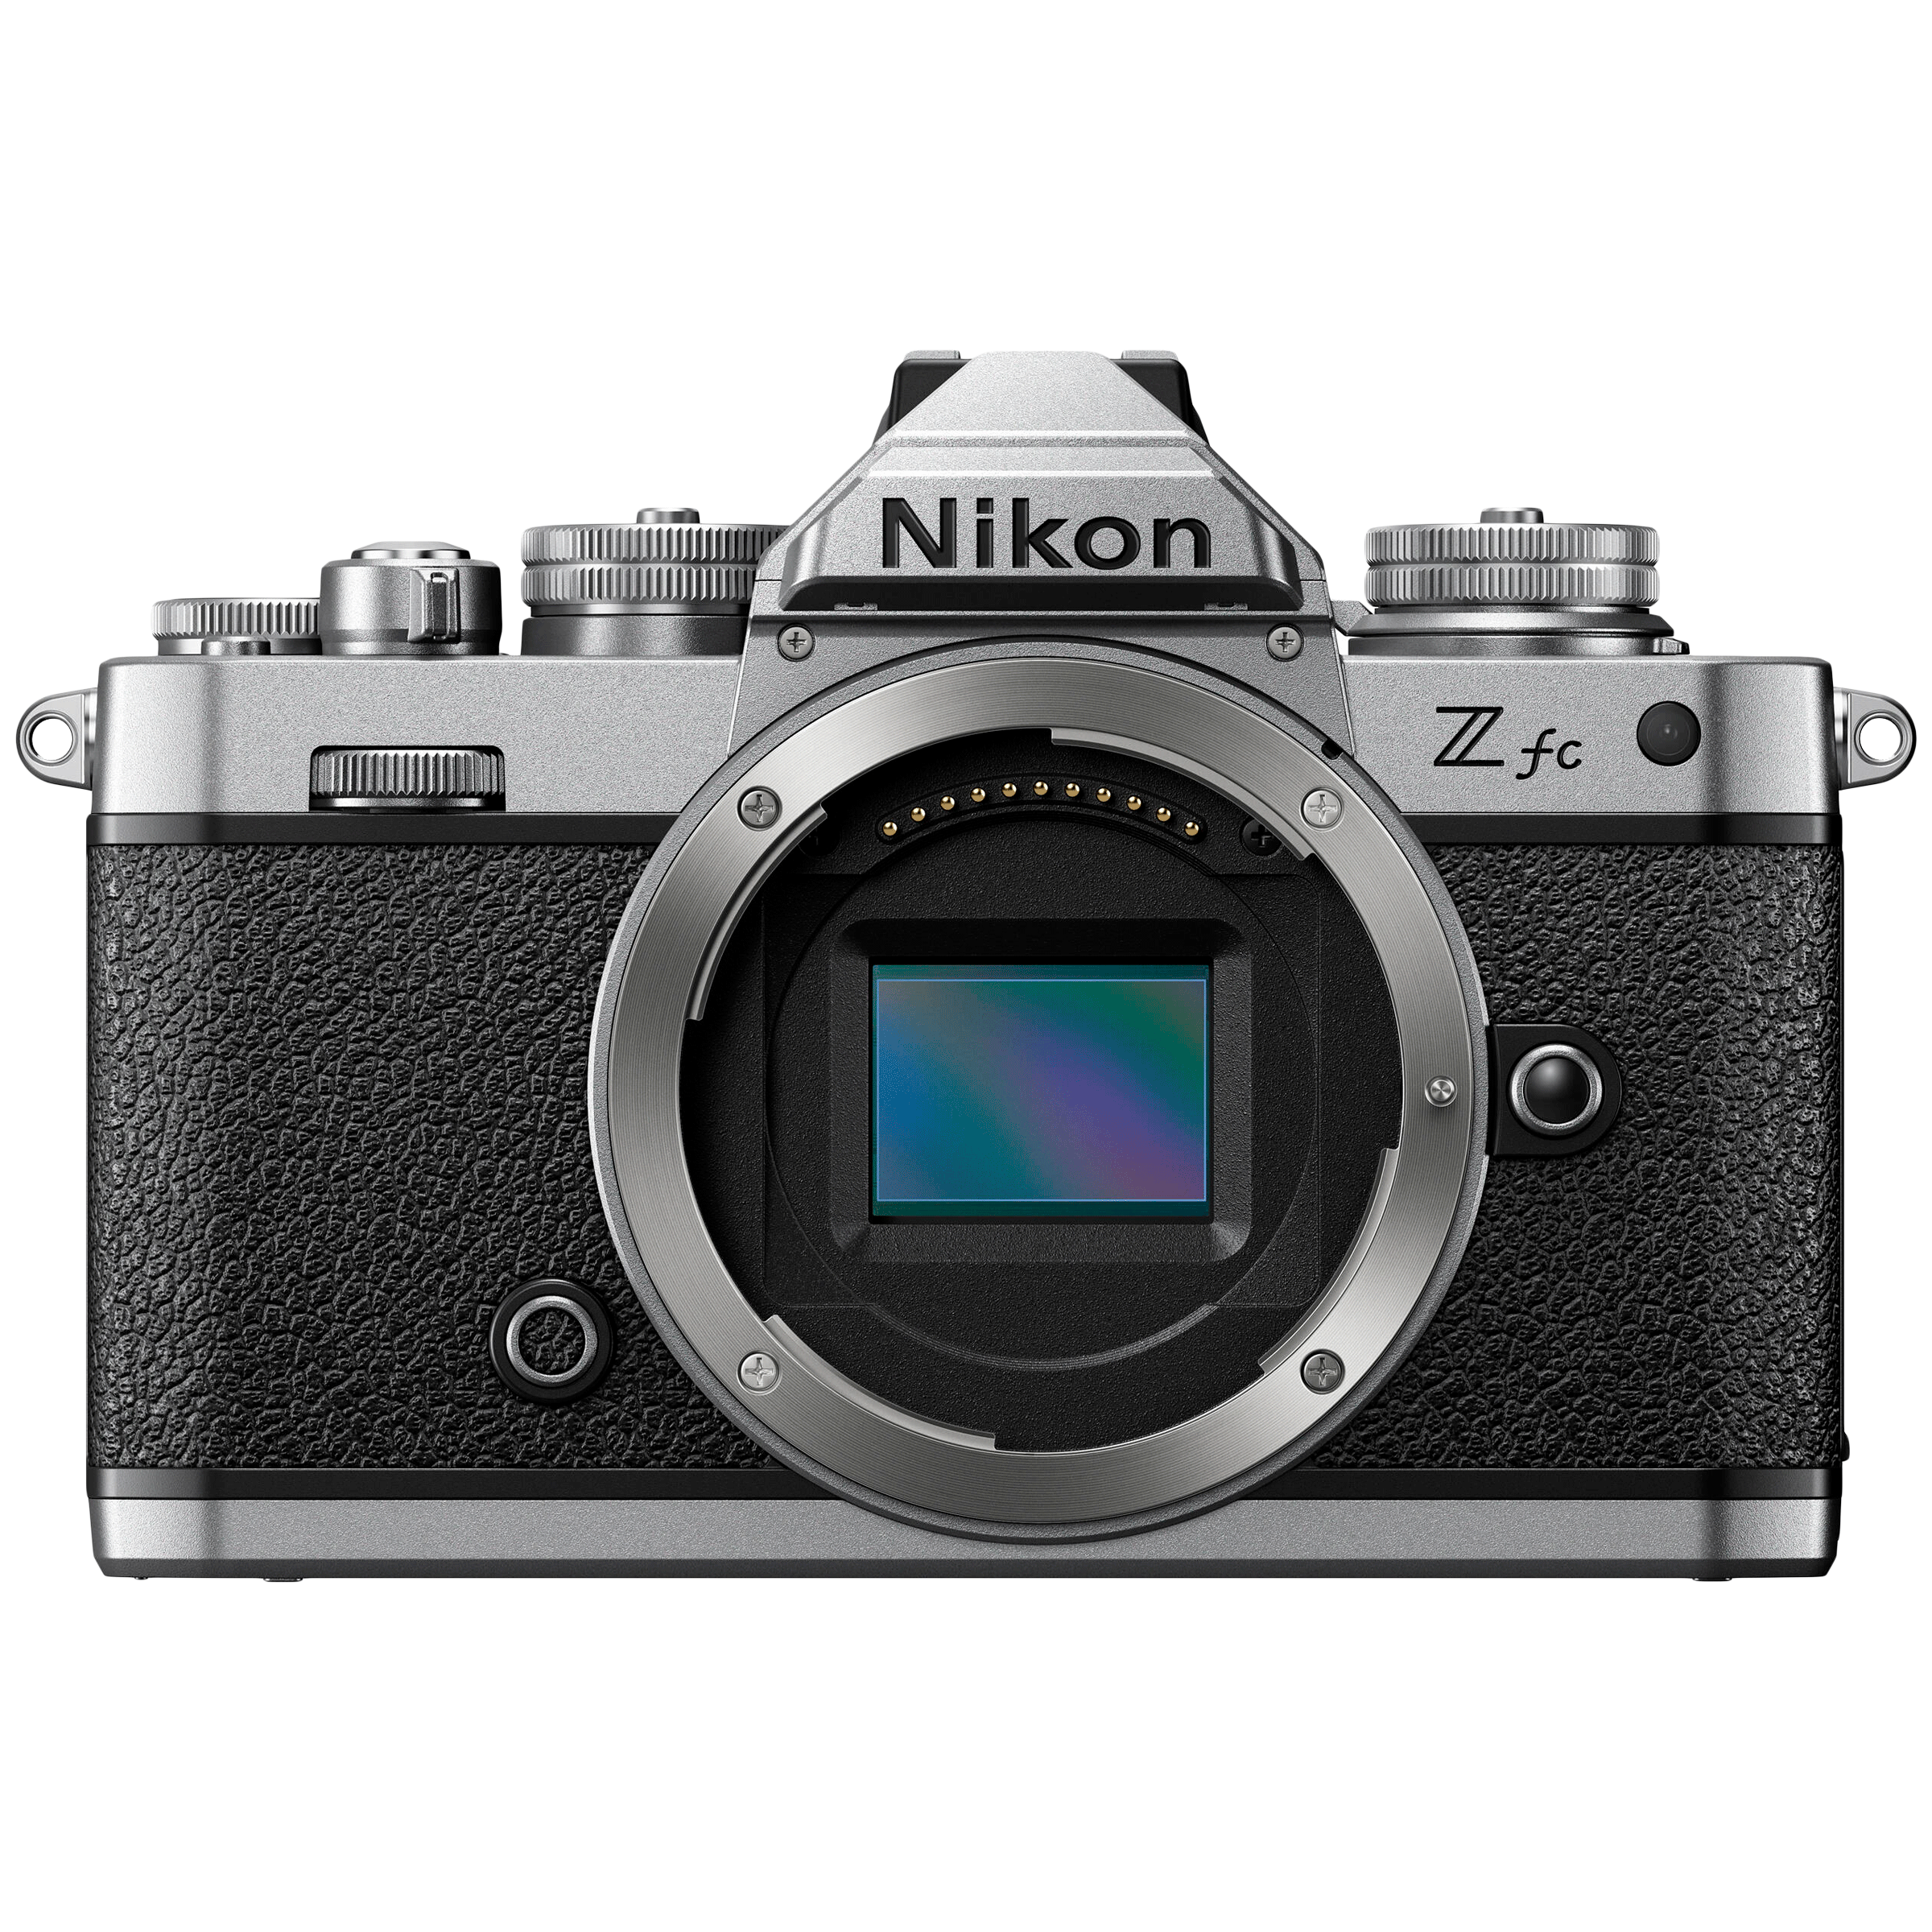 Nikon Z FC 20.9MP Mirrorless Camera (Flash-Ready Indicator, VOA090AN, Black)_1